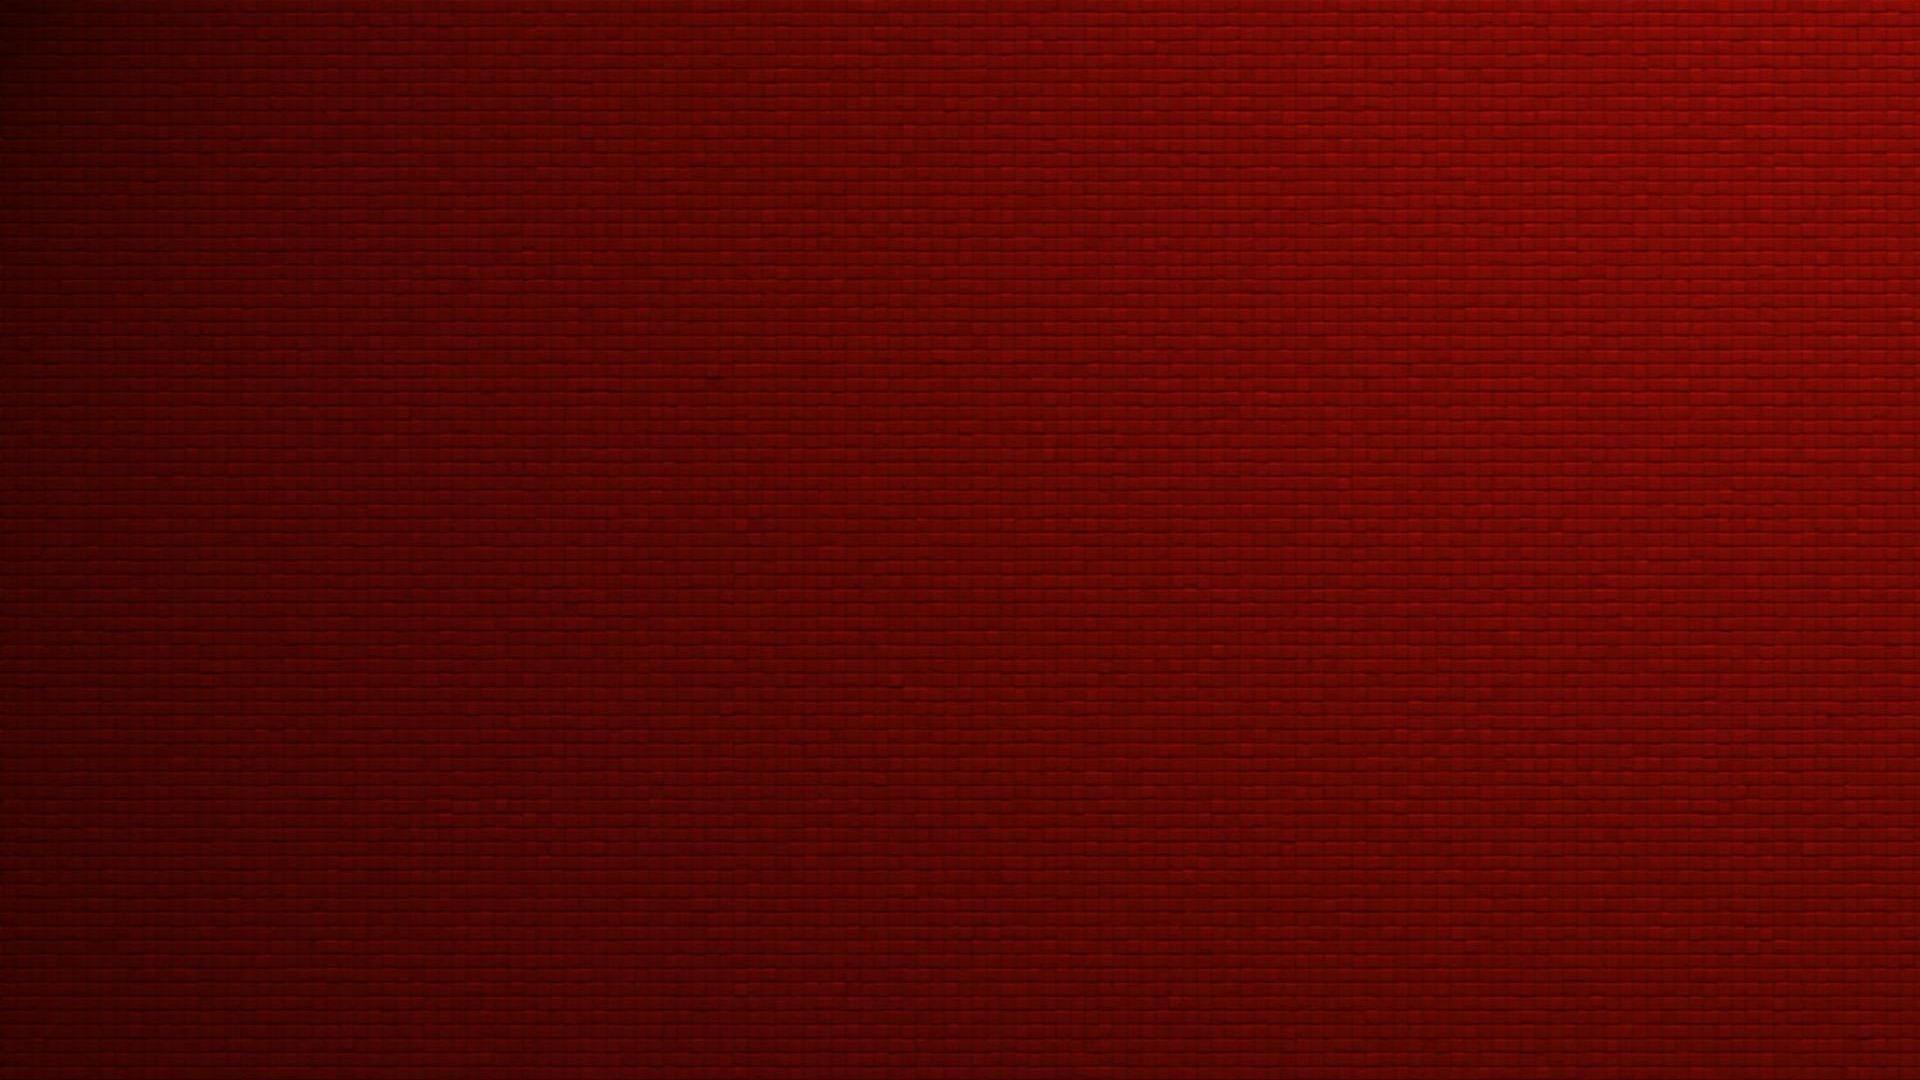 Burgundy 1920x1080 wallpaper